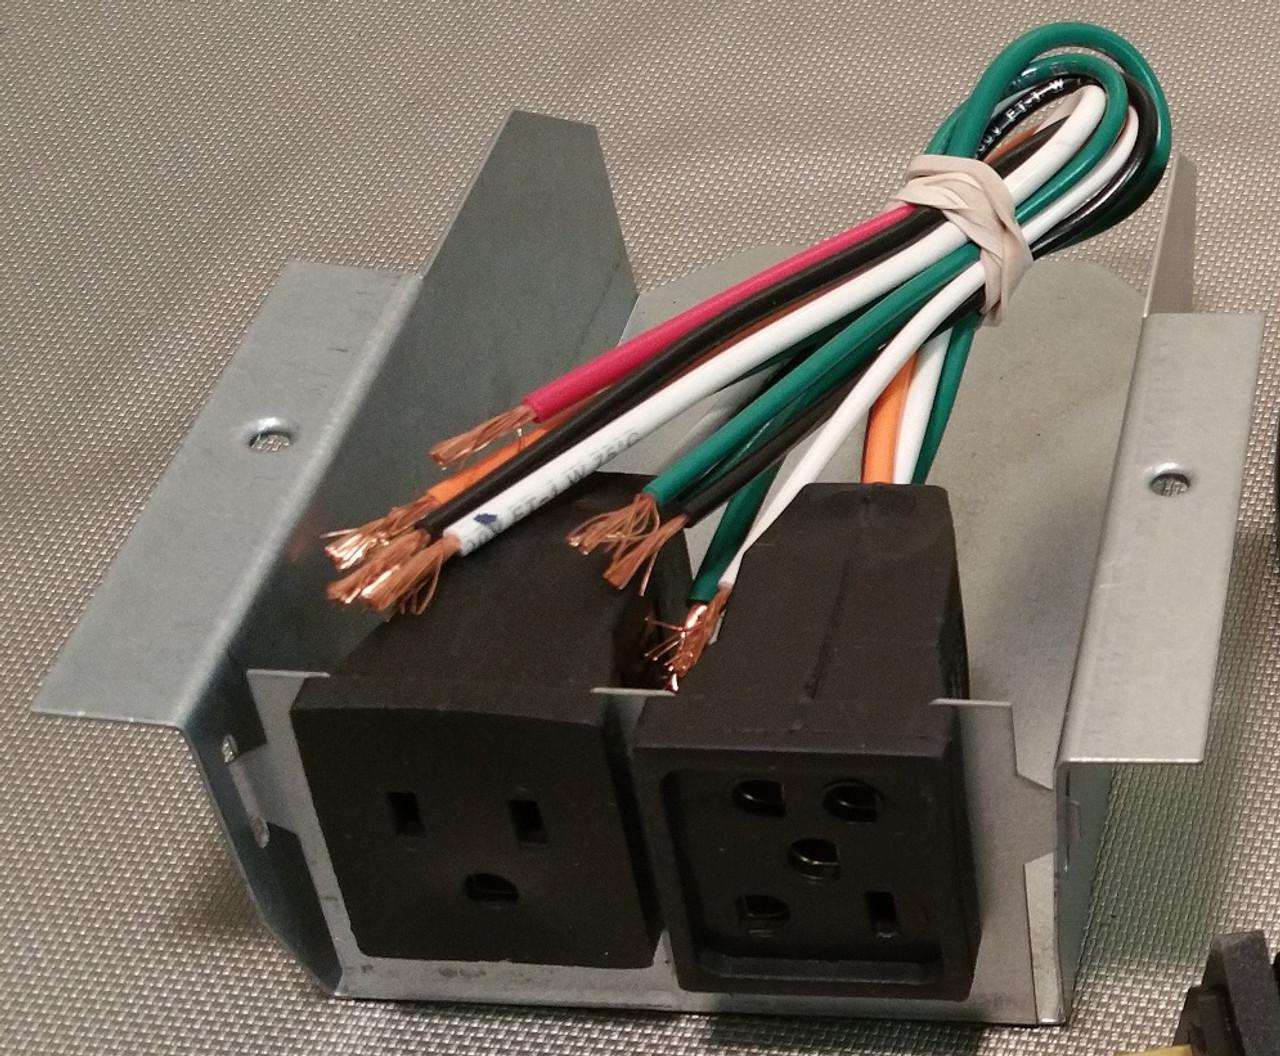 mastercool electrical wiring diagram, mastercool wiring to breaker box,  mastercool side draft diagram,